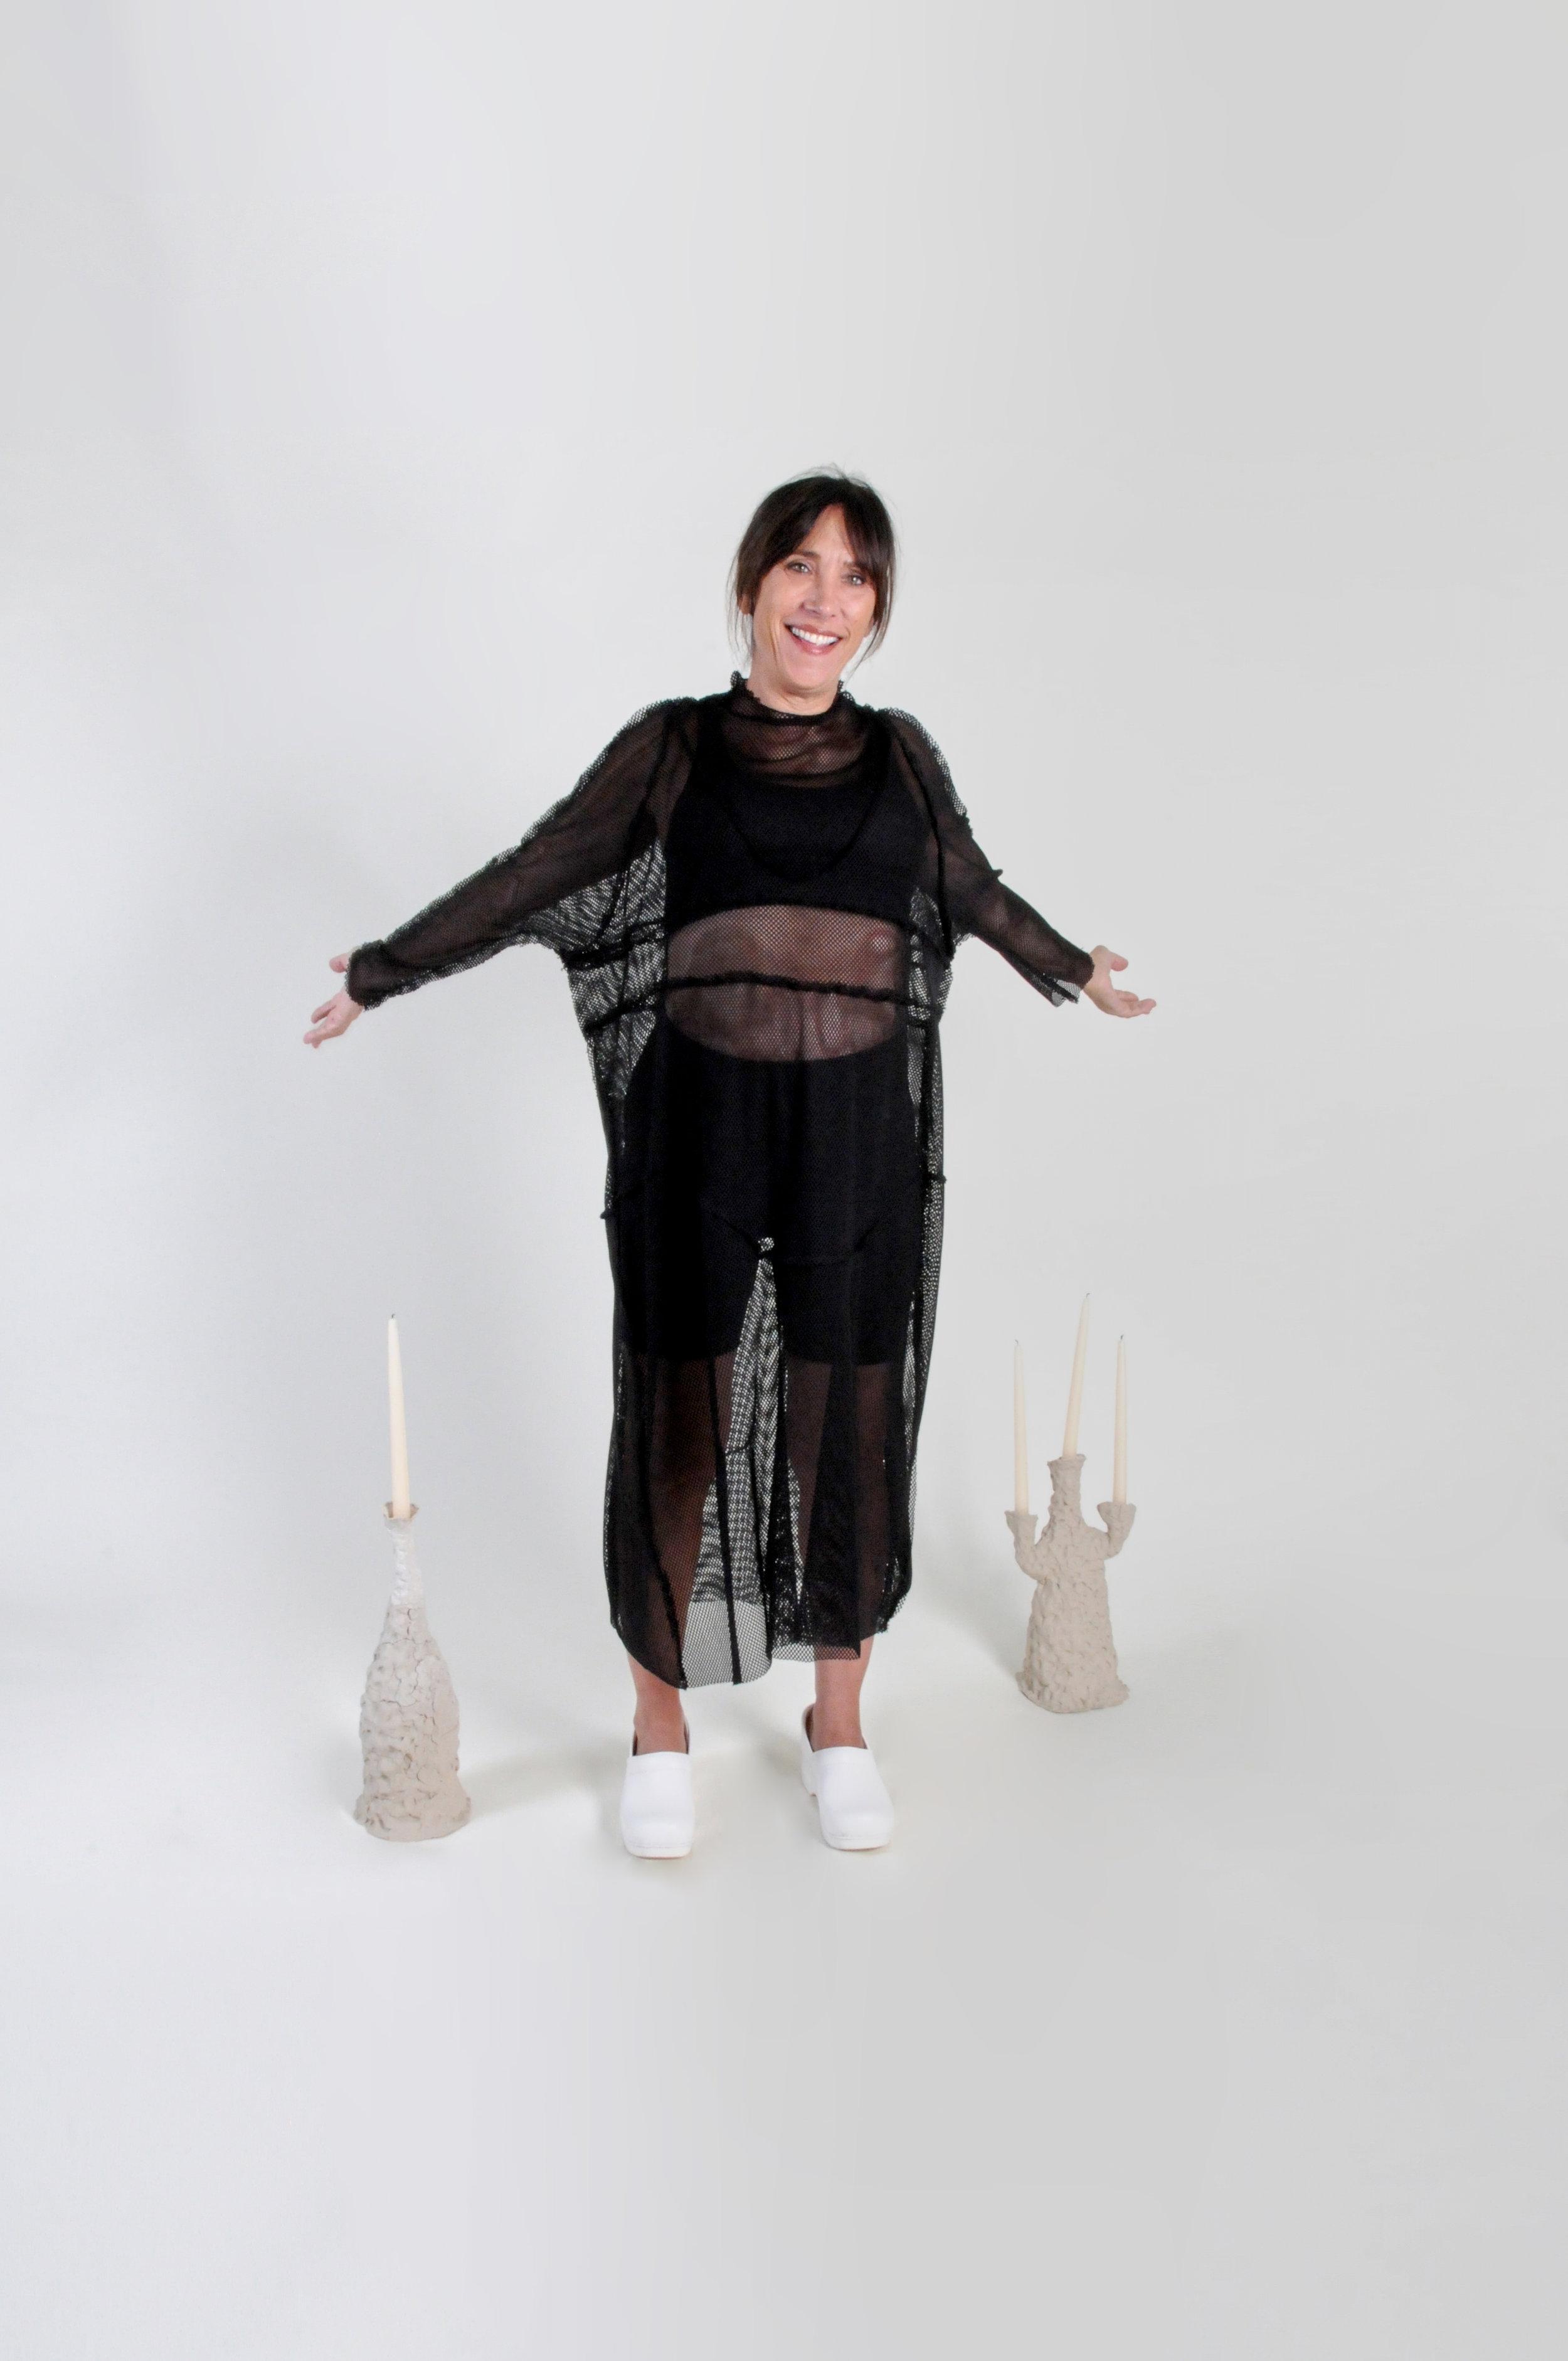 underwear dress: black net - 0216COLOR : BLACKFABRIC : DEADSTOCK STRETCH NETCONTENT: COTTON / POLY / RAYON BLENDWHOLESALE $114 / RETAIL $228SIZES : ONE SIZE / FITS XS - XL